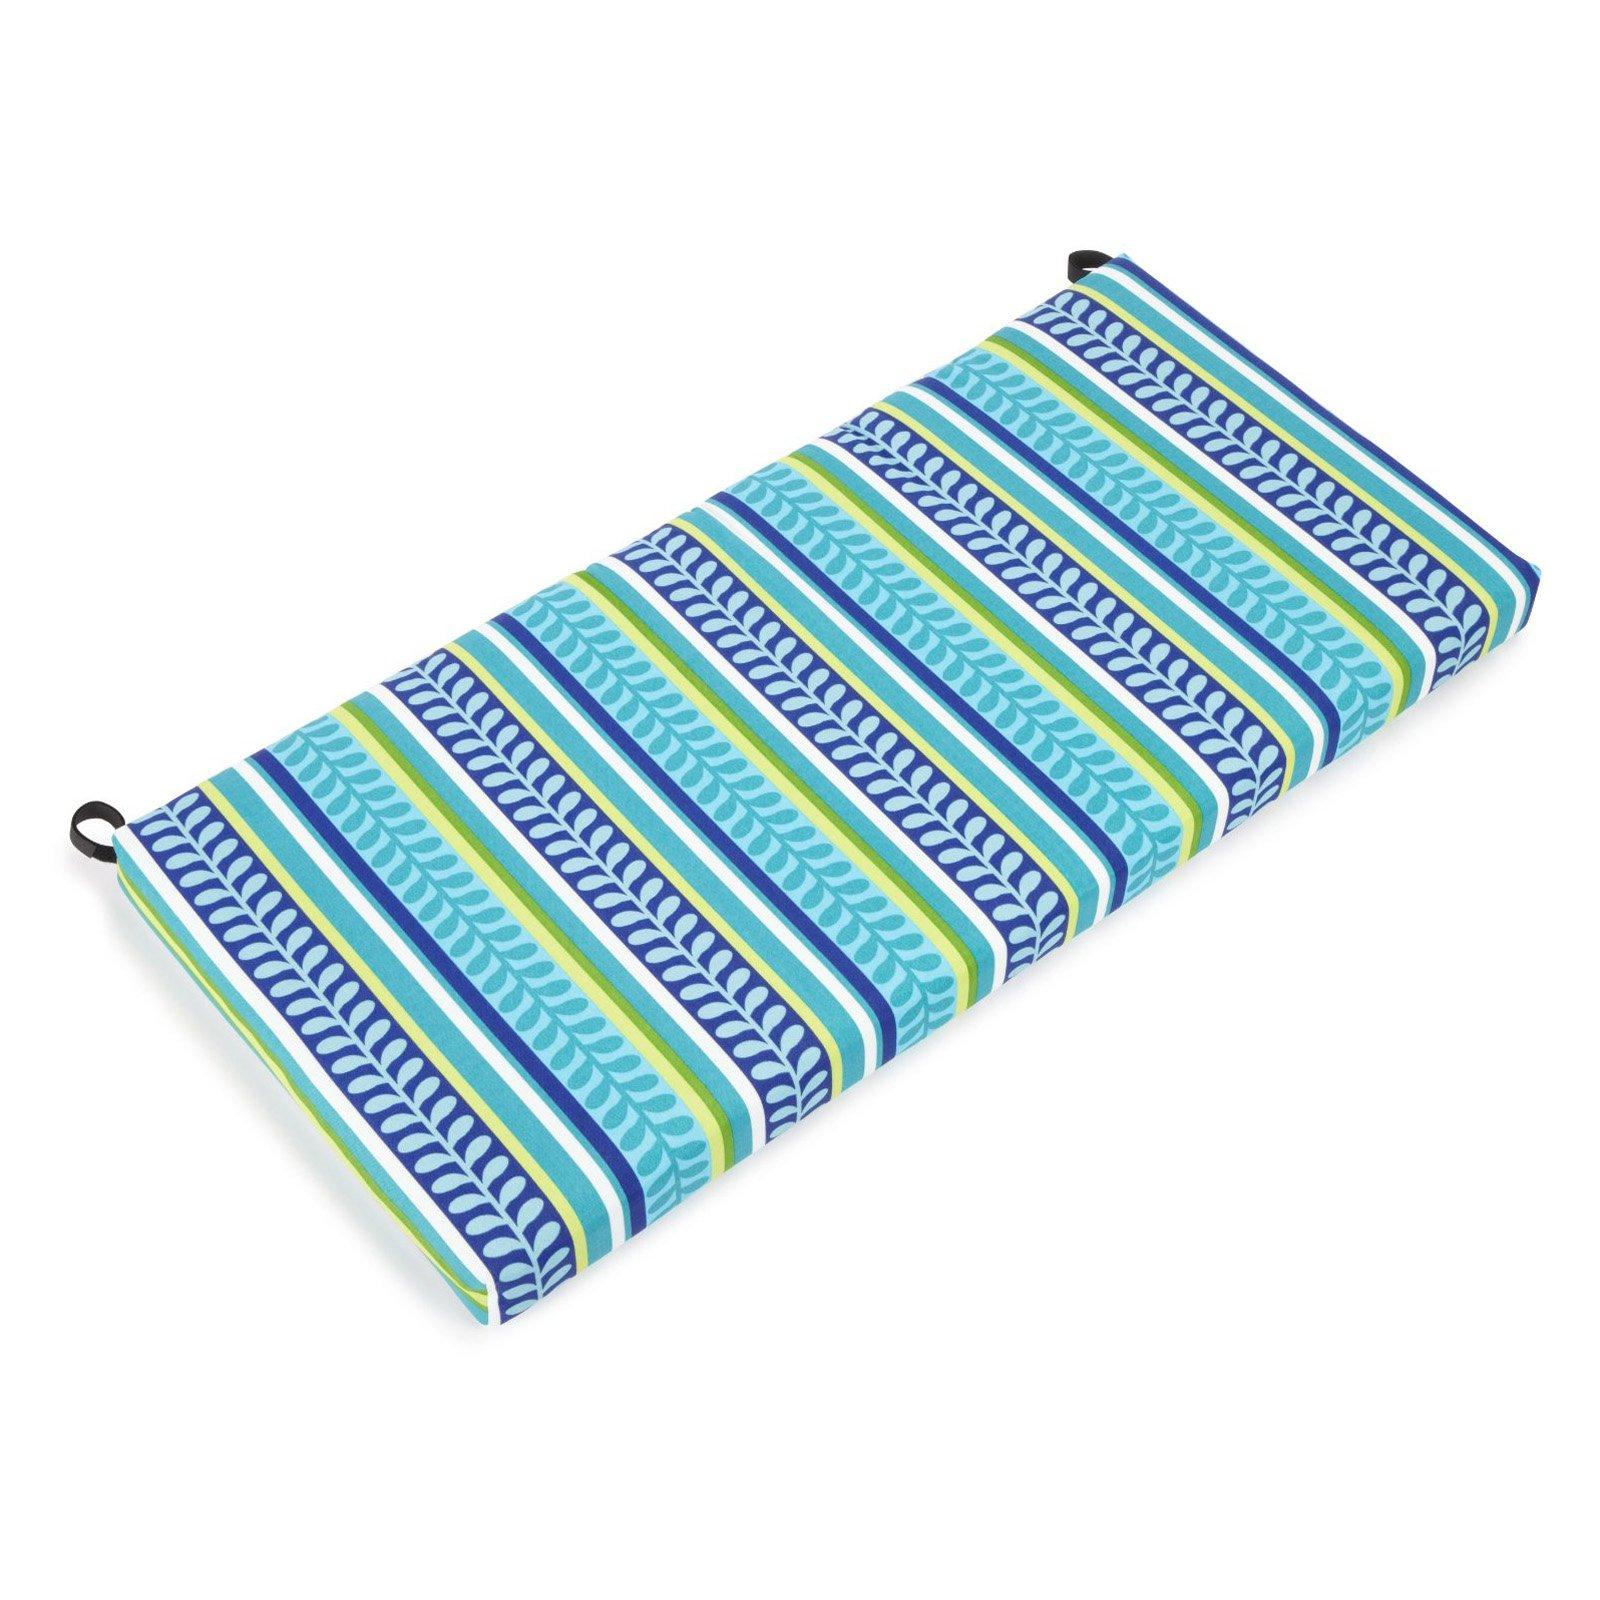 Blazing Needles Wrought Iron Conversation Set Patio Cushions - 3 pc. Set